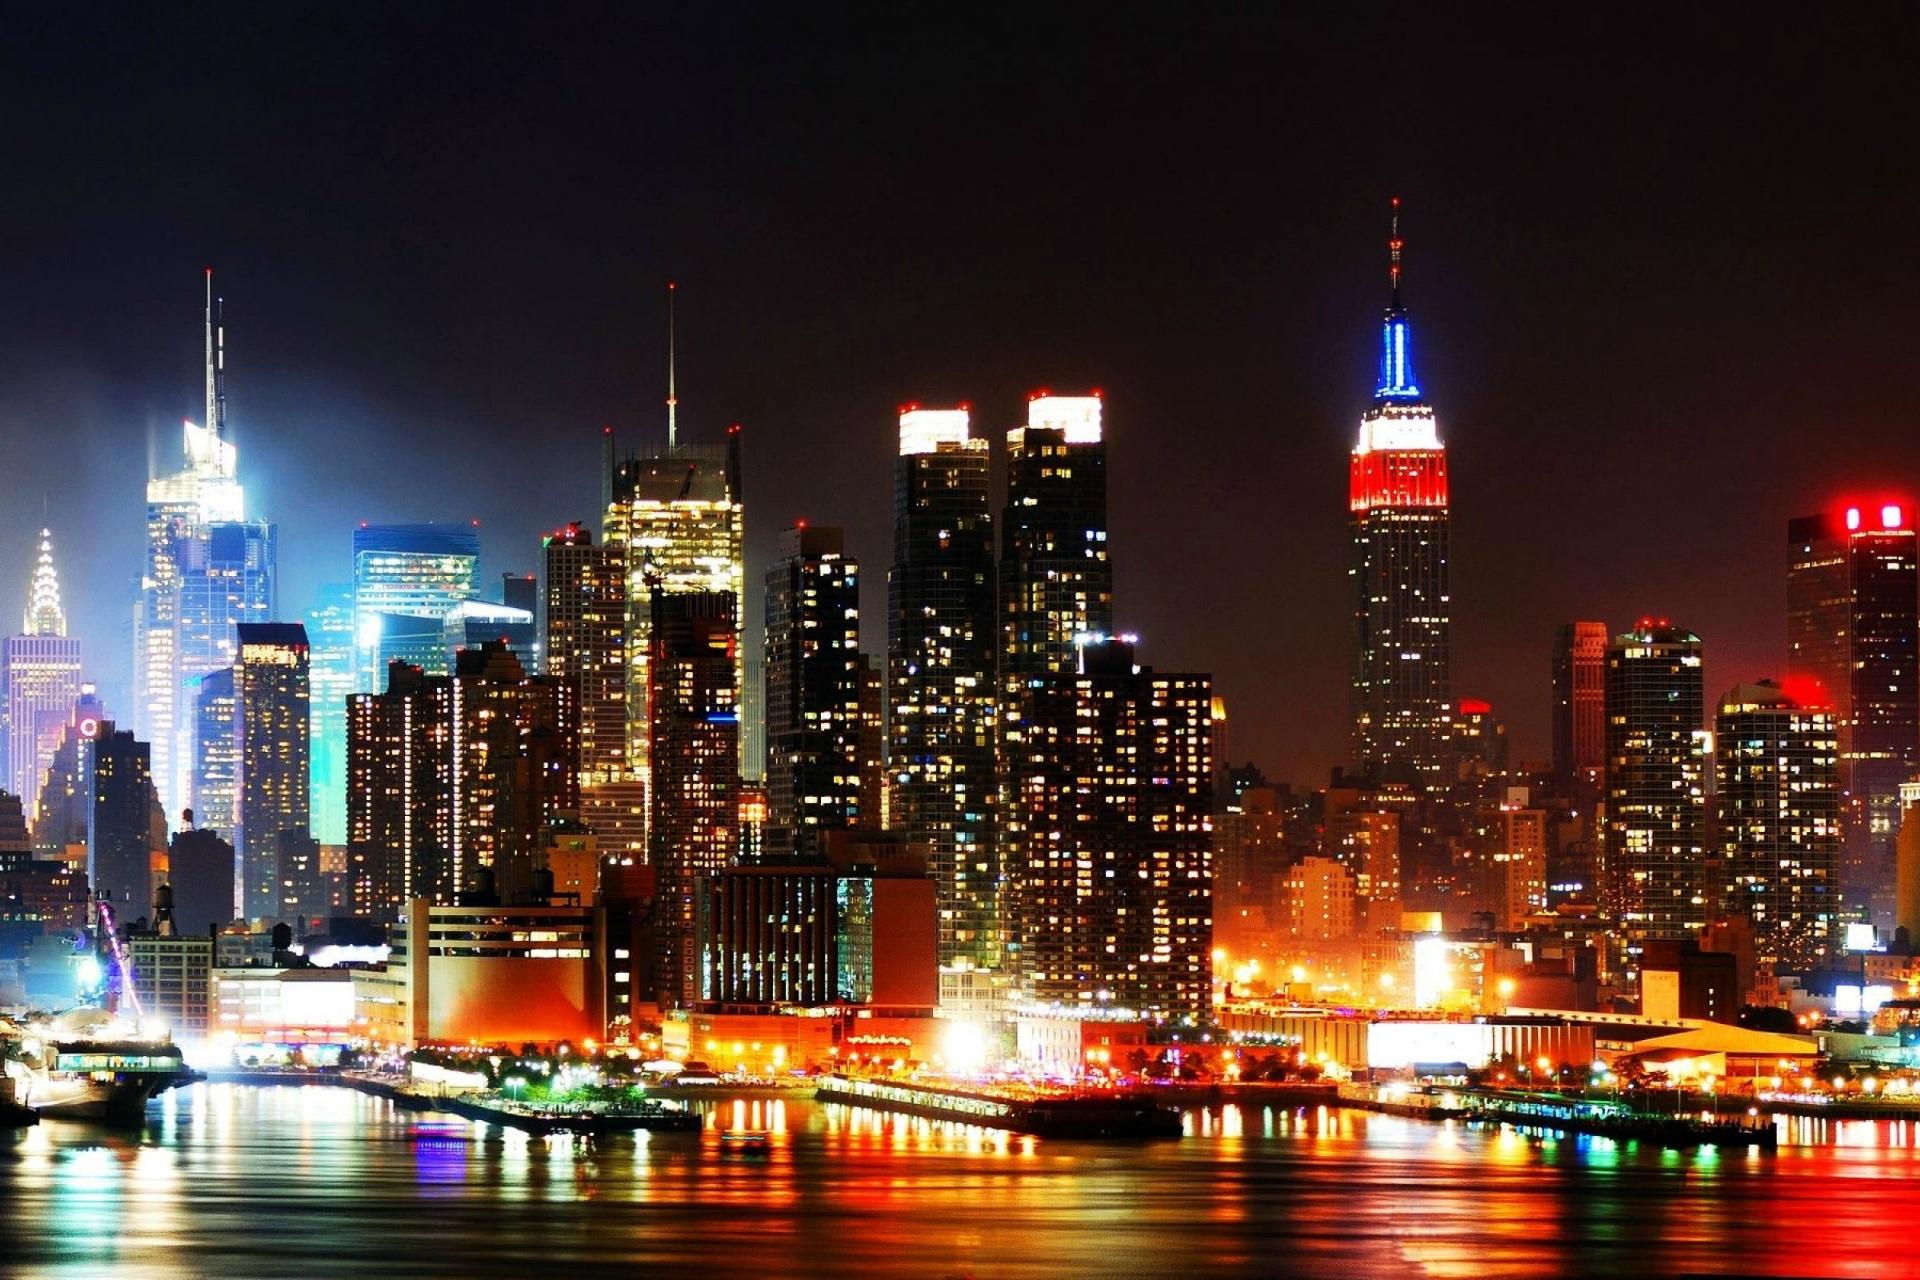 New-York-Skyline-At-Night-2560x1600-Wallpaper-background-glassfactory-nyc.jpg